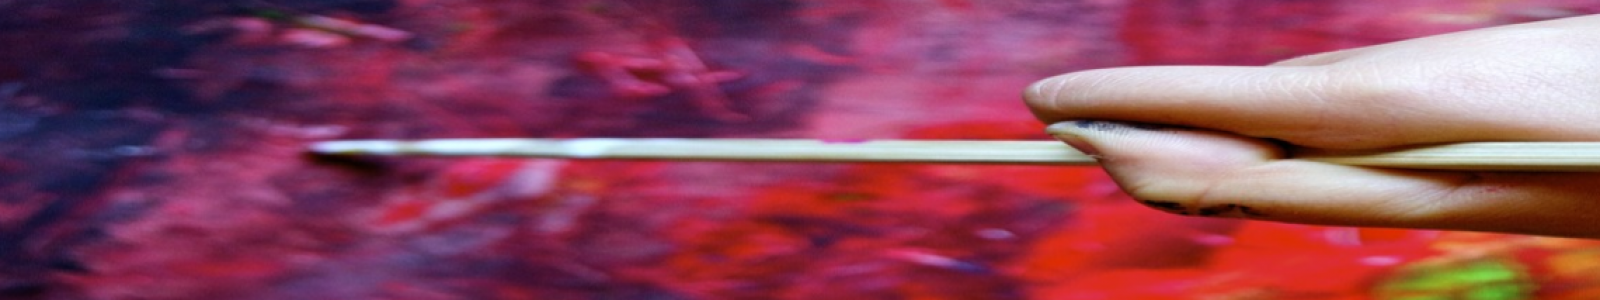 Gallery Painter Mikhail Denysenko